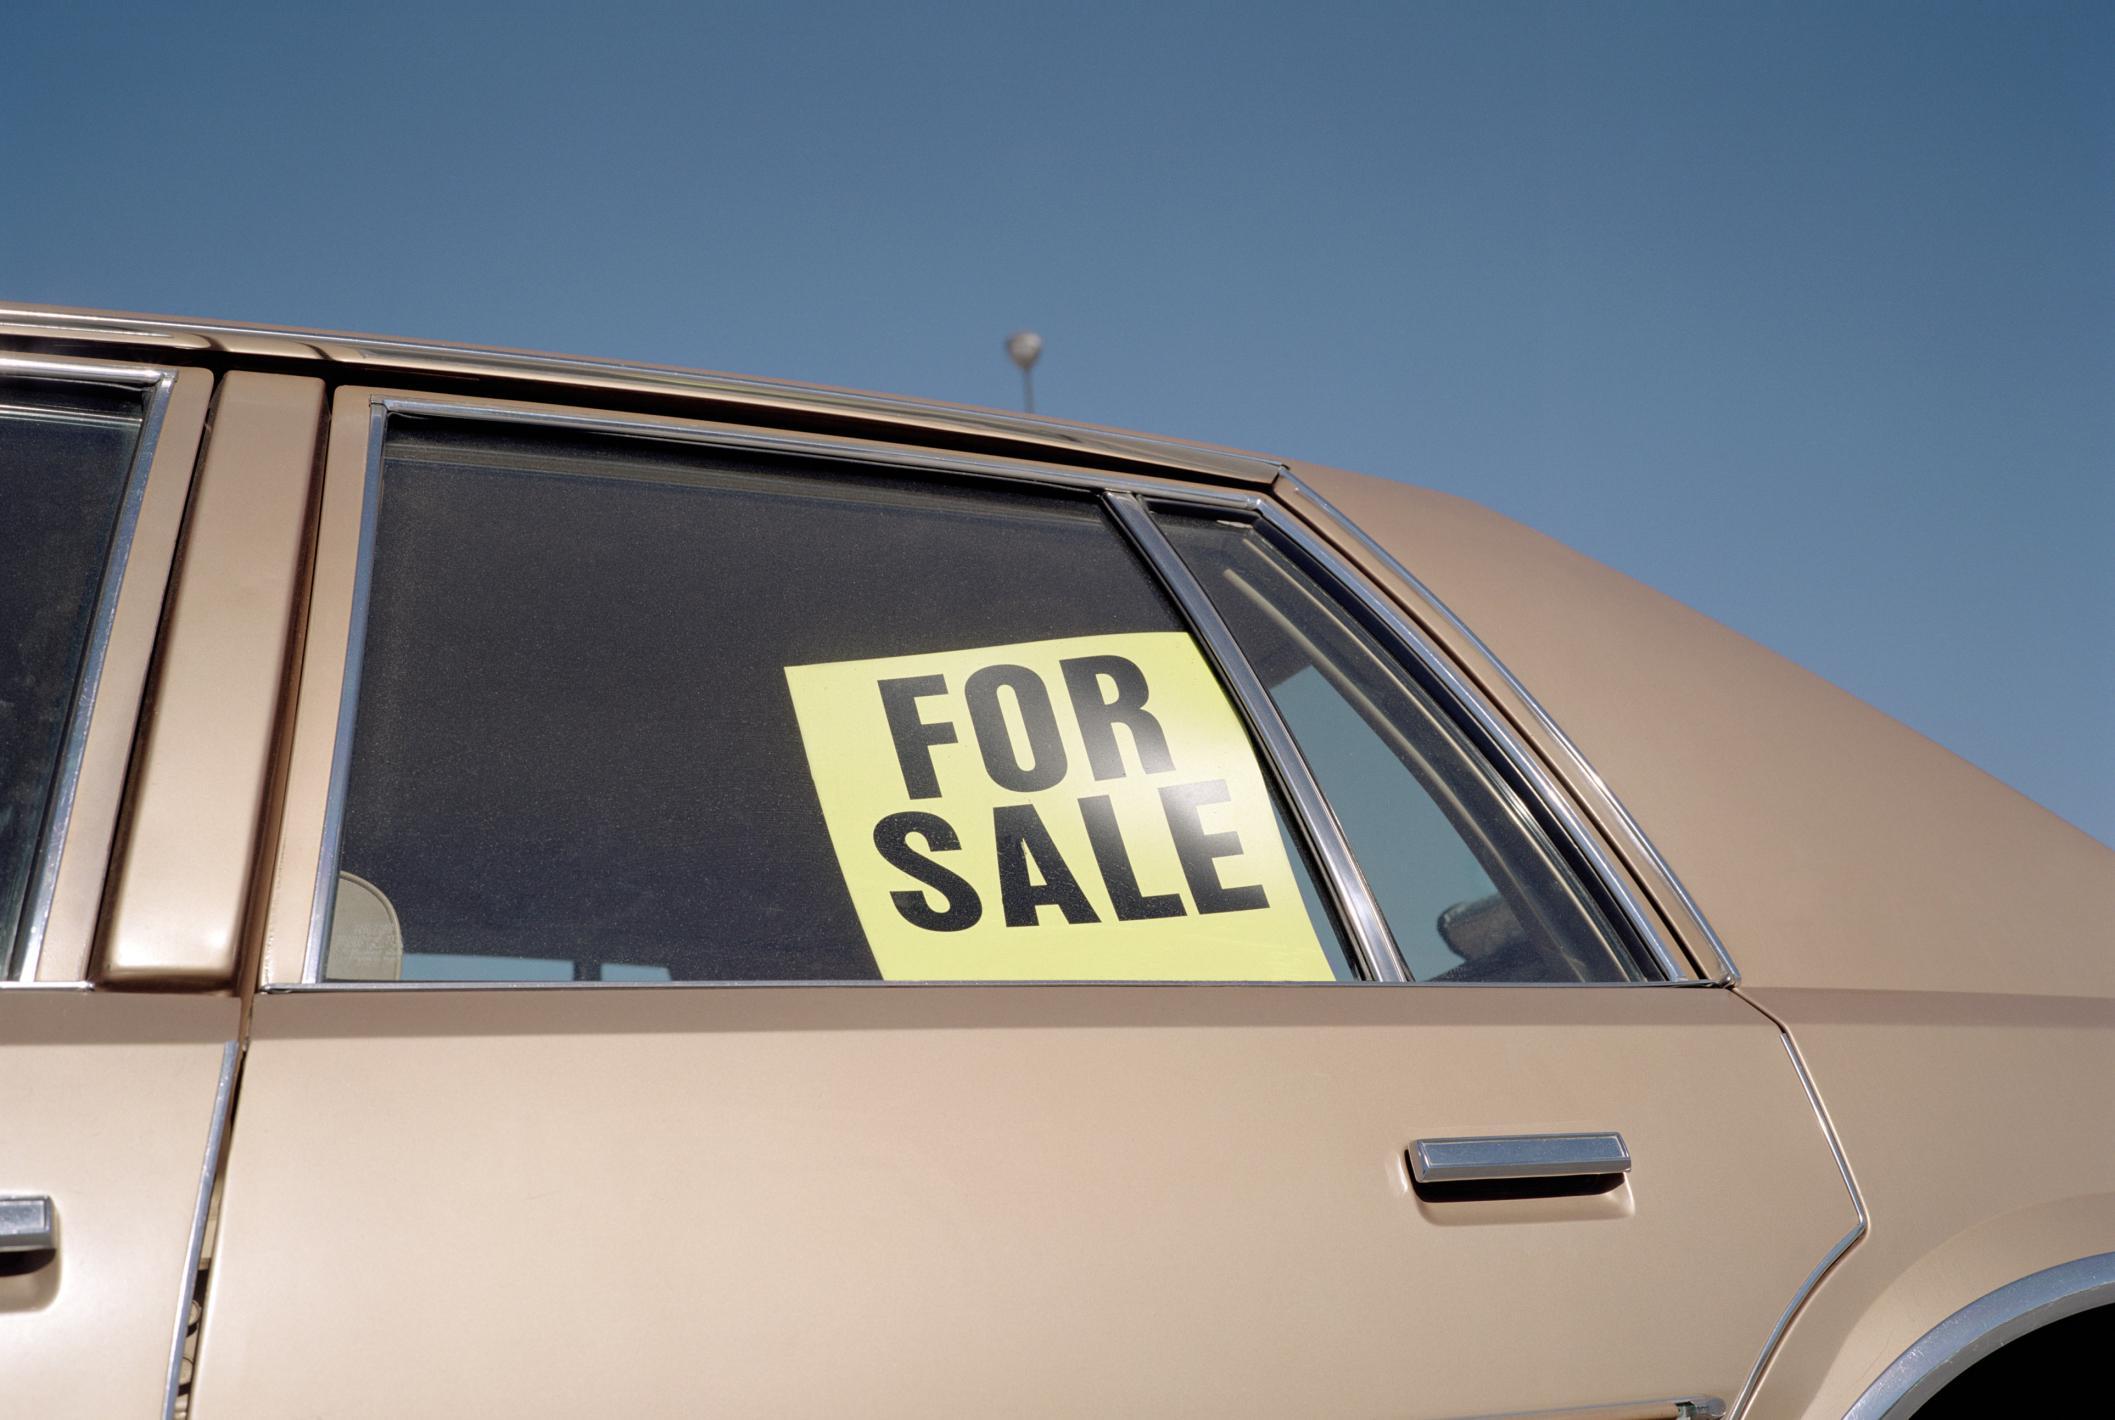 Car Comparison Sites, car for sale, sell your car, buy car, car auction